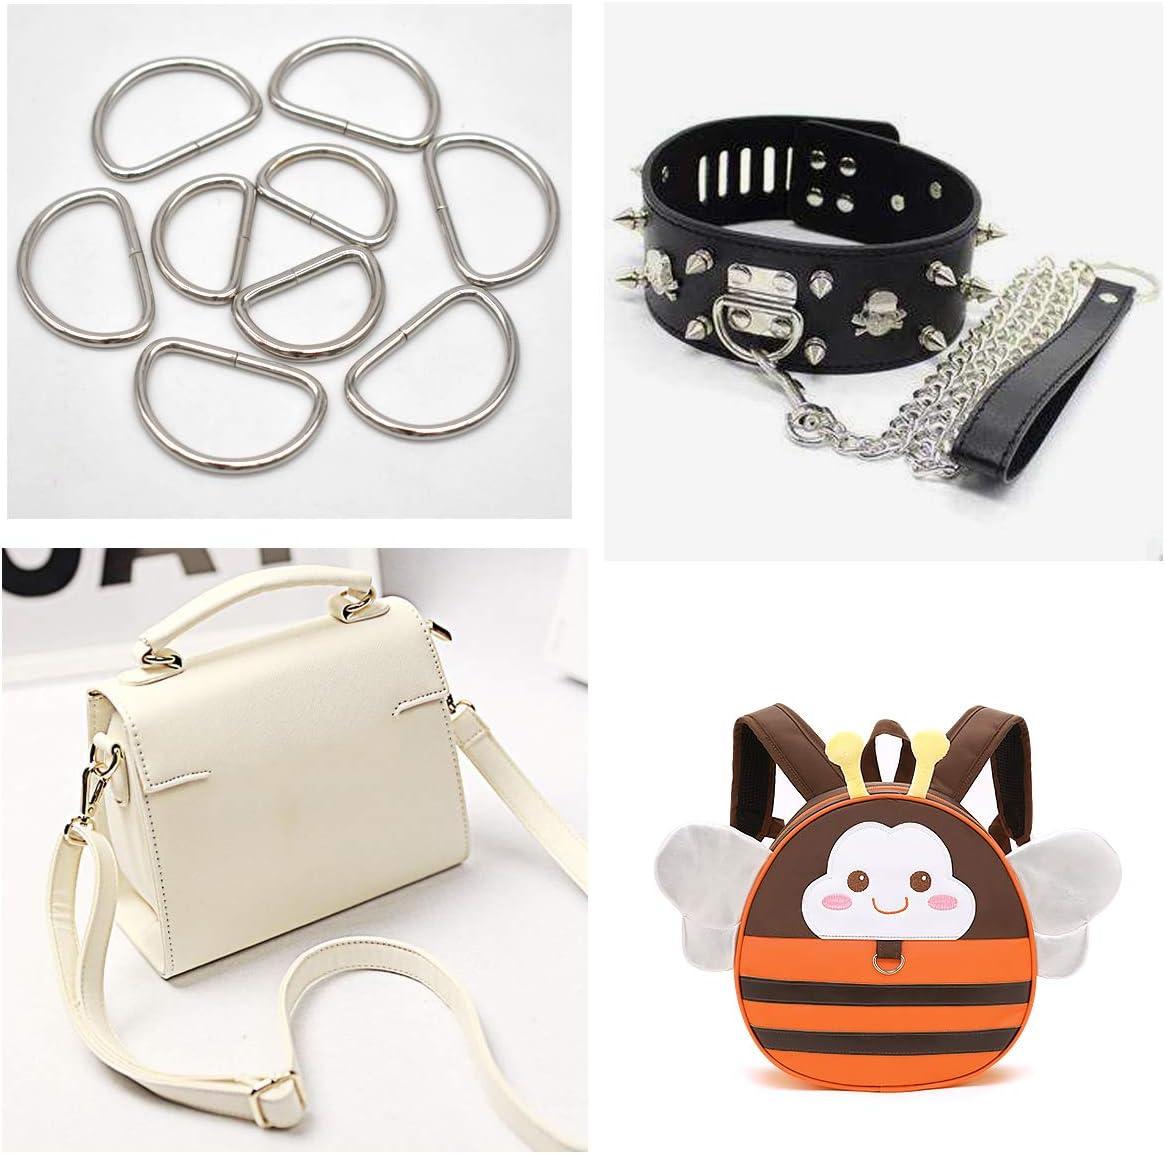 Xiuyer 100 pcs Metal D Rings /& Tri Glide Slide Buckles Sewing Hardware Accessory for DIY Backpack Handbag Purse Belt Handicraft 25mm 32mm Silver